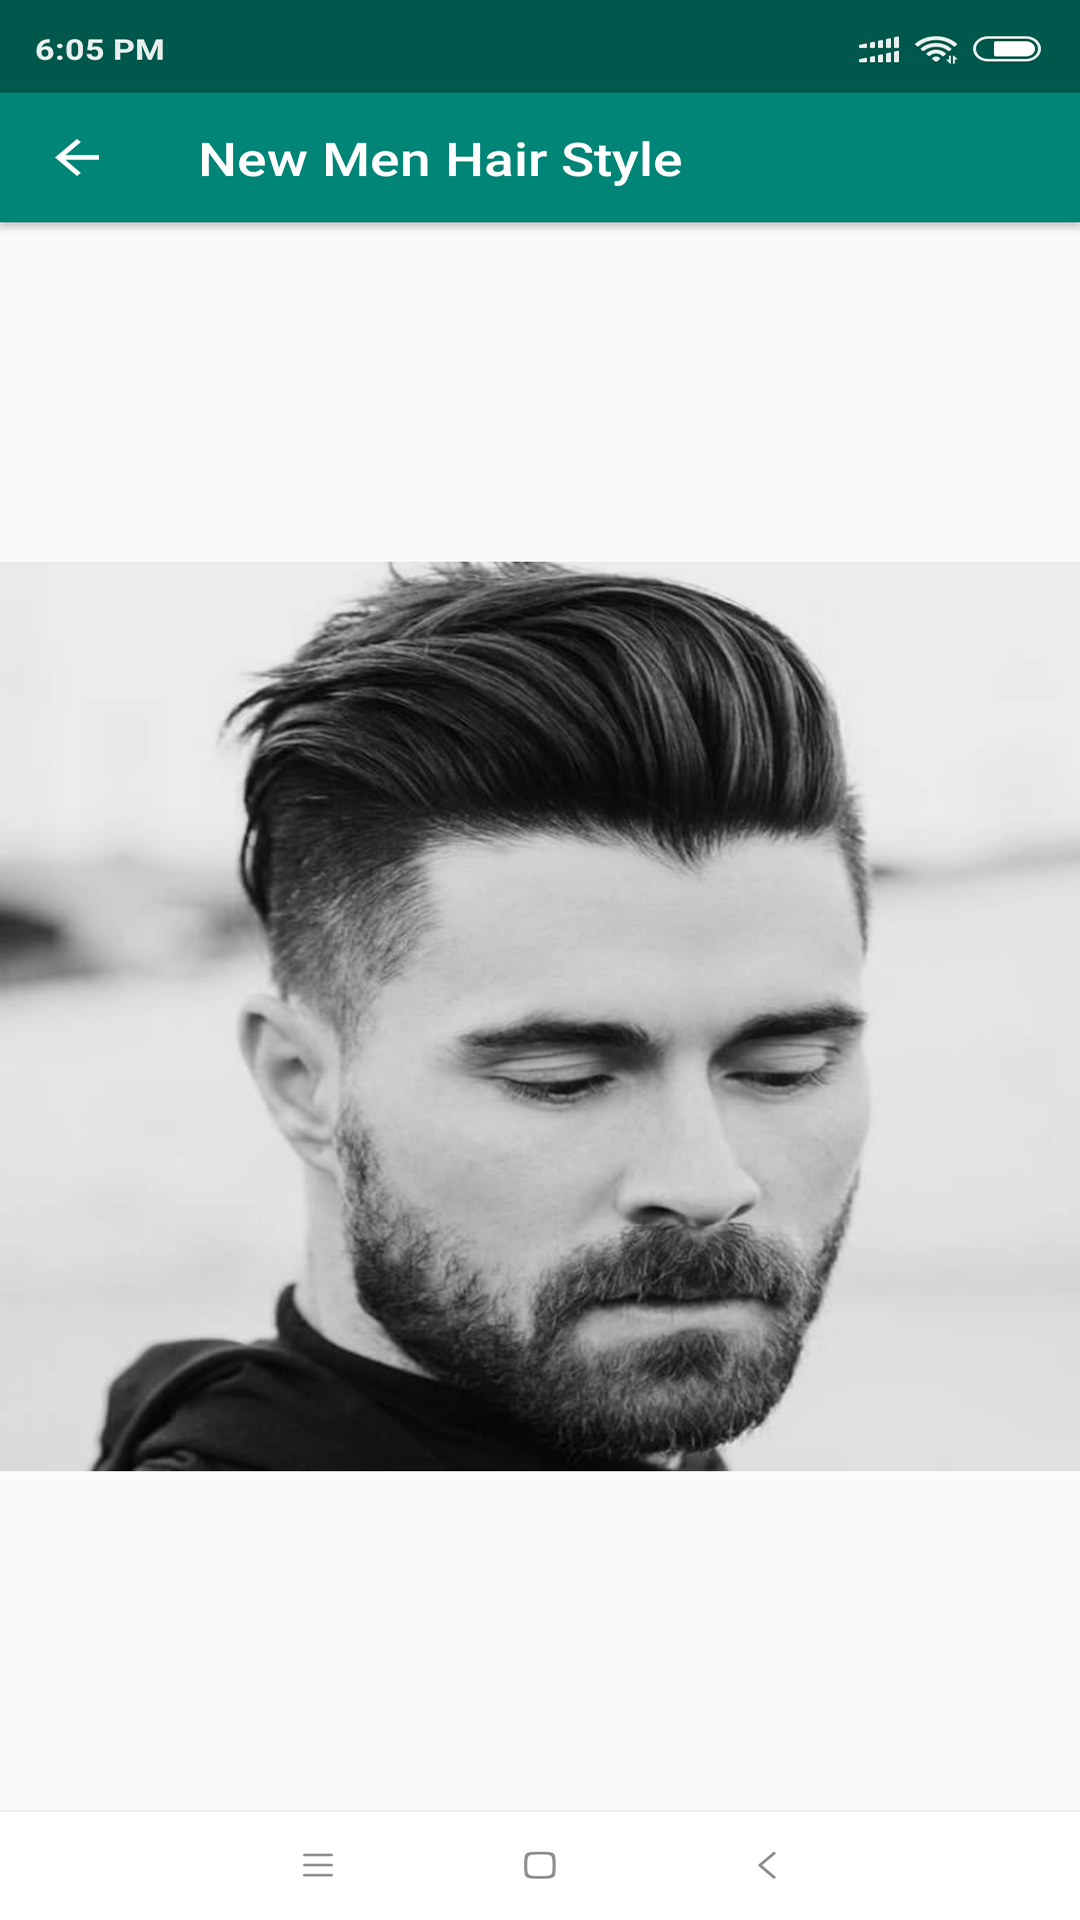 New Men Hair Style Amazon Com Br Amazon Appstore